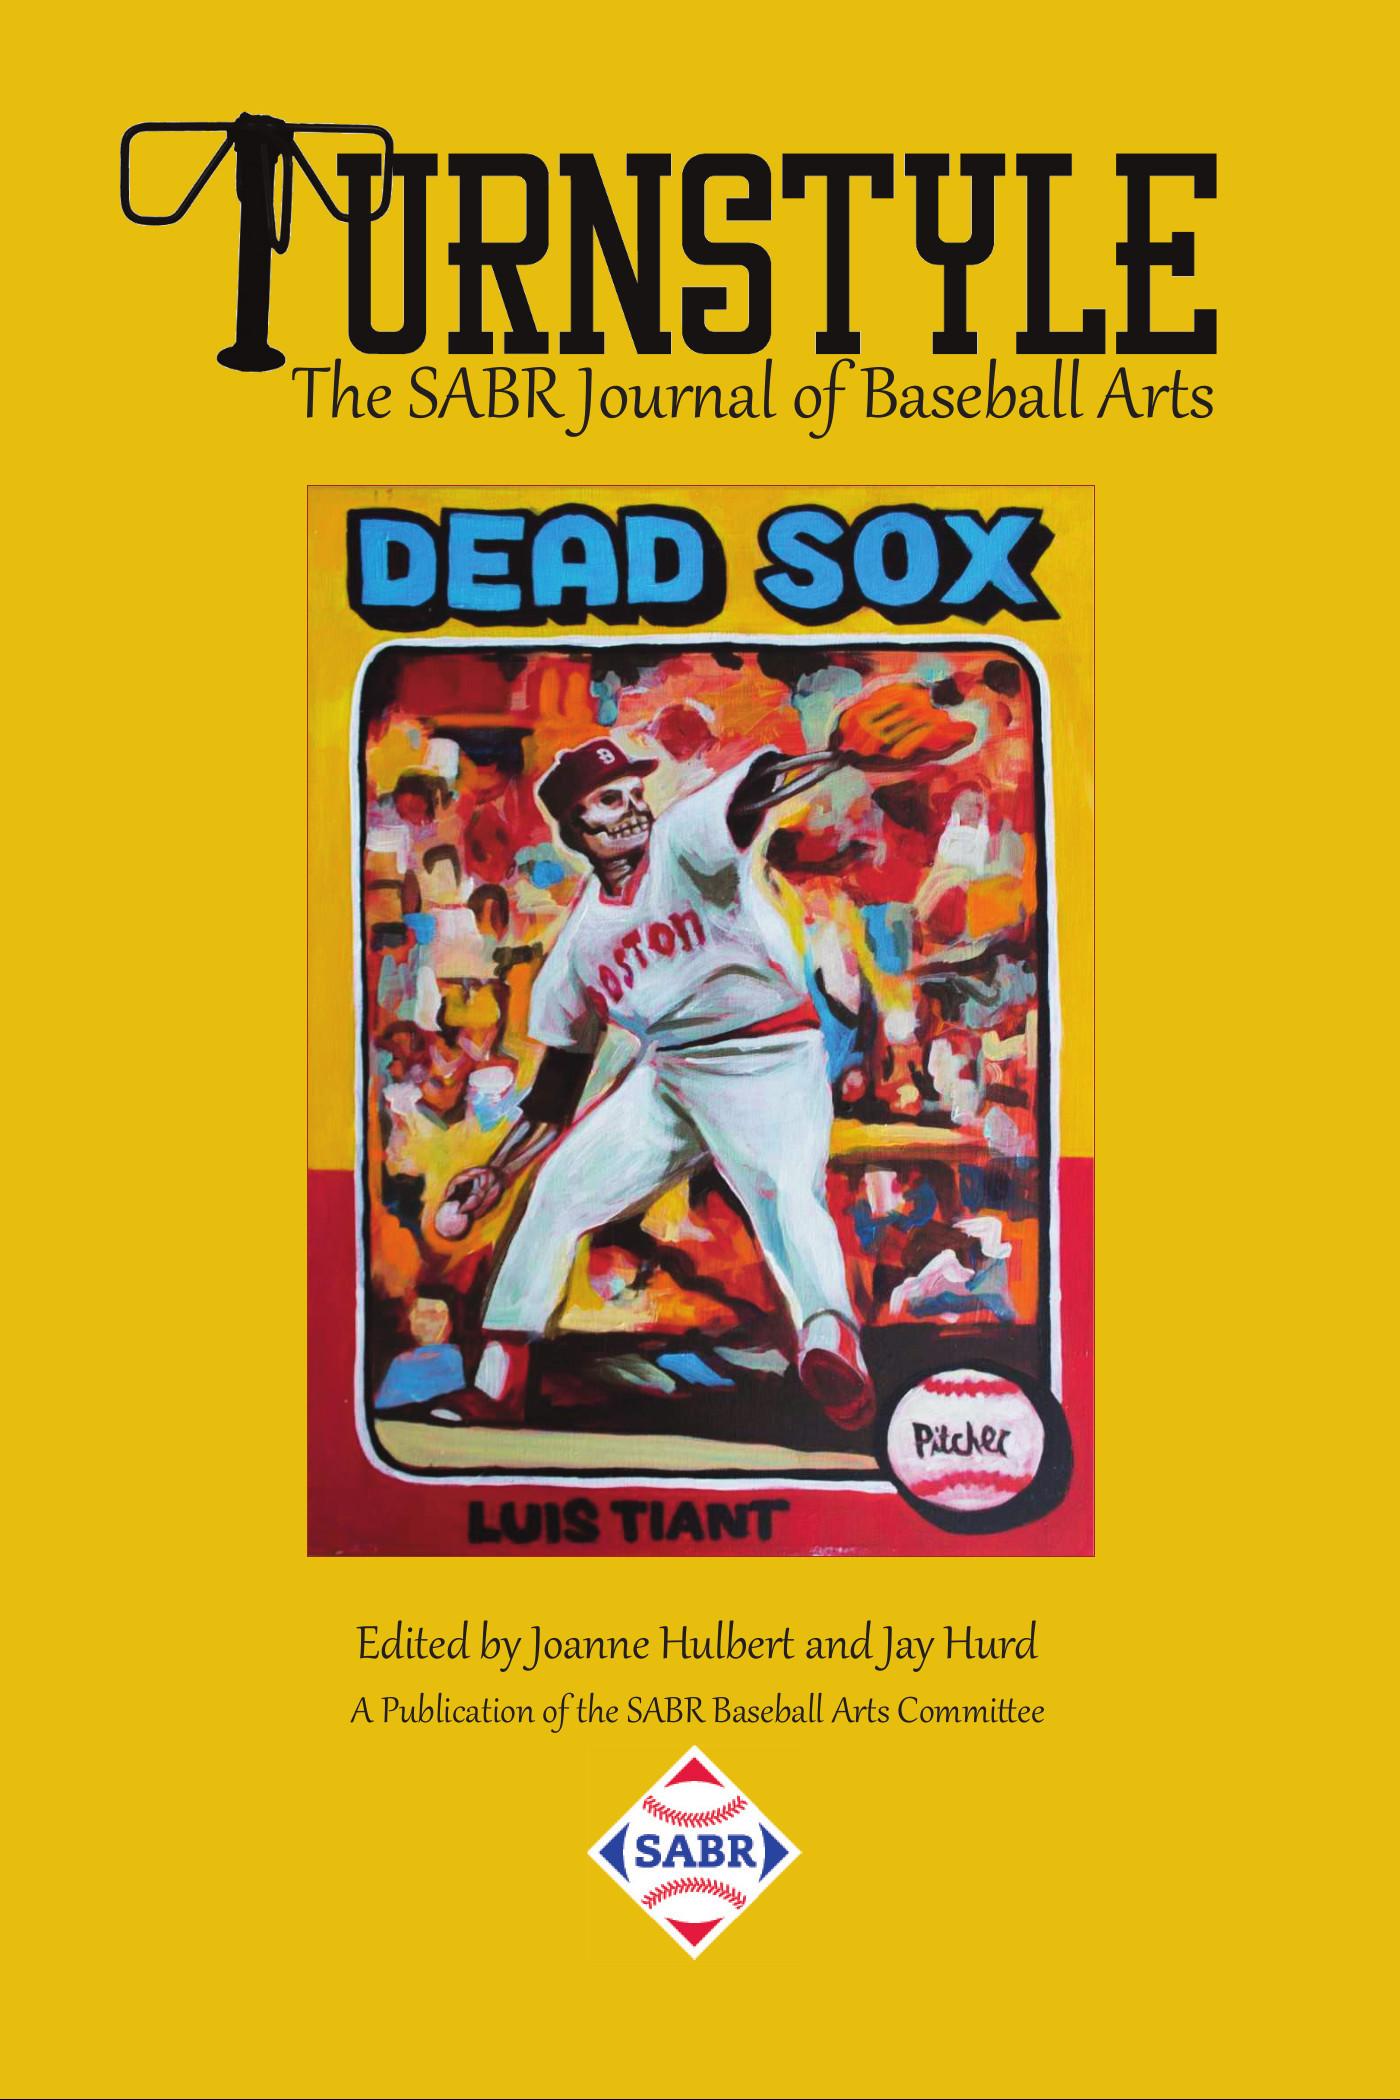 Turnstyle: The SABR Journal of Baseball Arts, Volume 2 (2020)